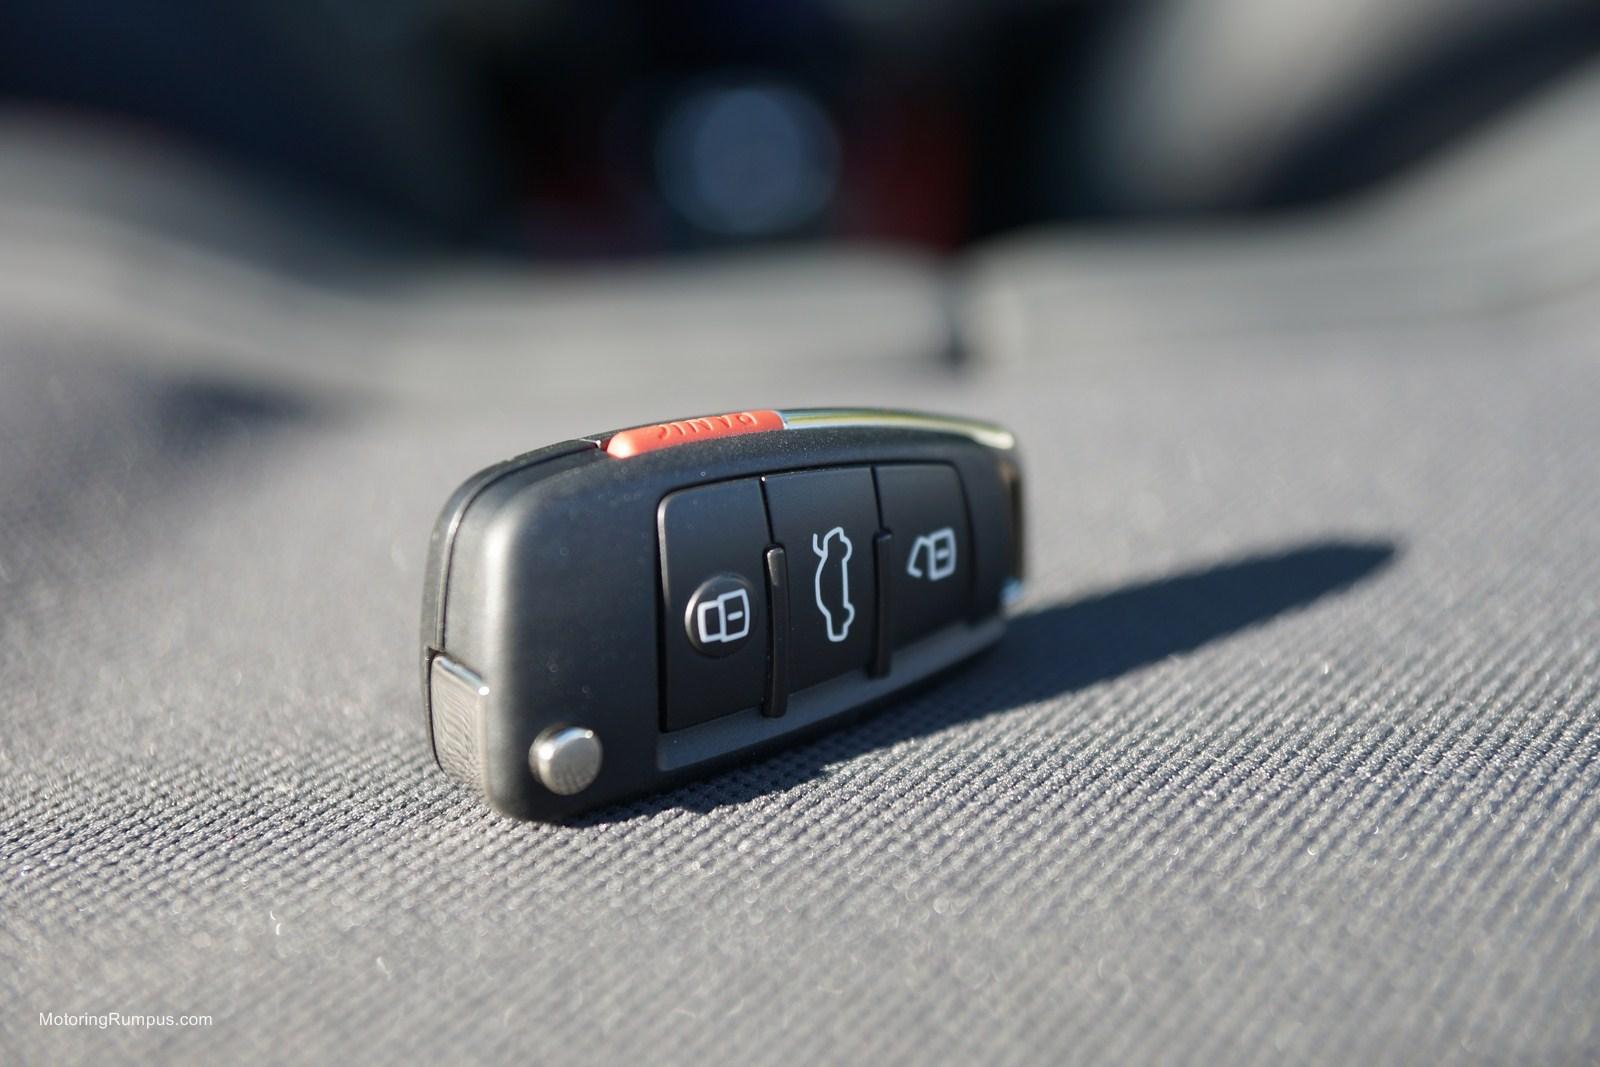 2013 Audi Tt Rs Key Motoring Rumpus